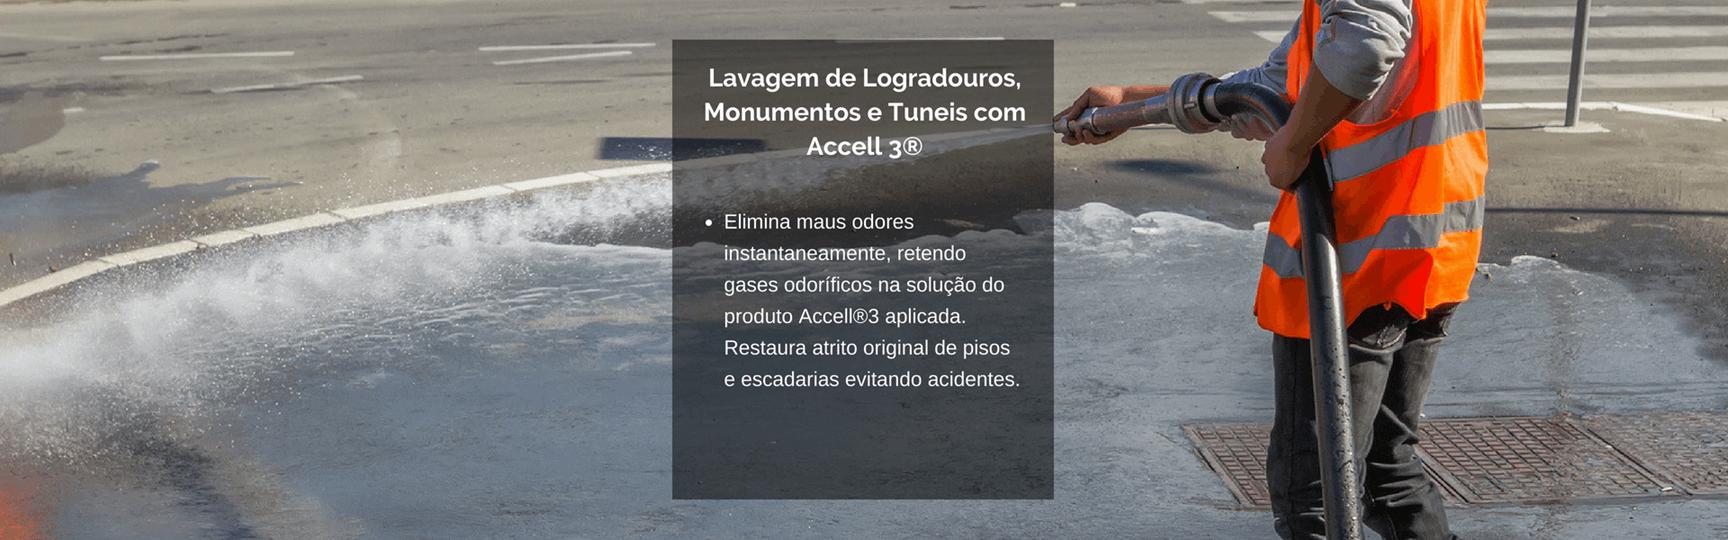 Verus-Ambiental-limpeza-de-logradouros-monumentos-e-tuneis